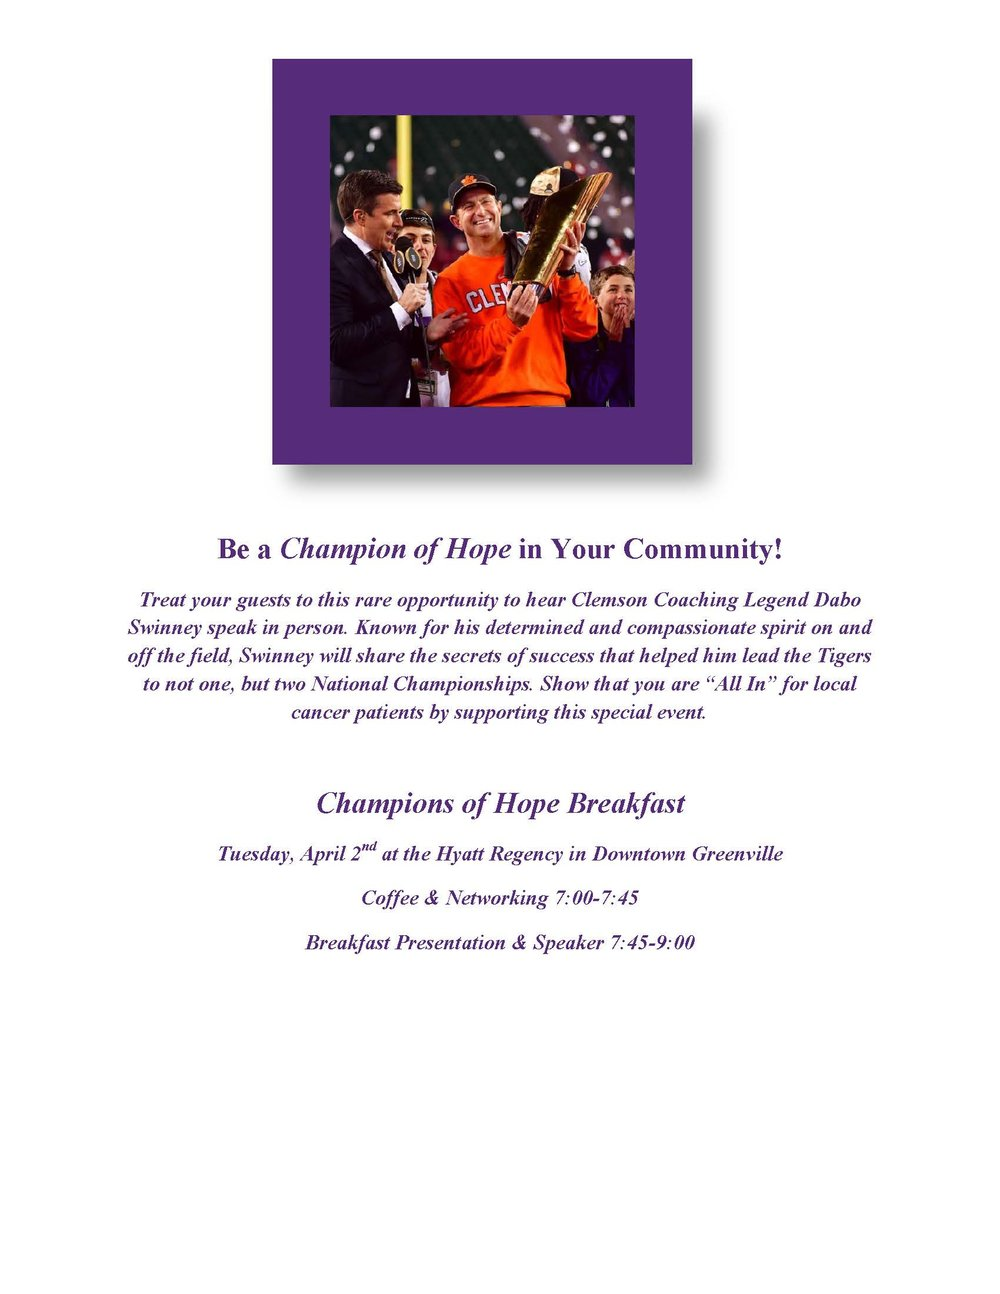 Champions of Hope Breakfast Sponsorships-final8_Page_2.jpg